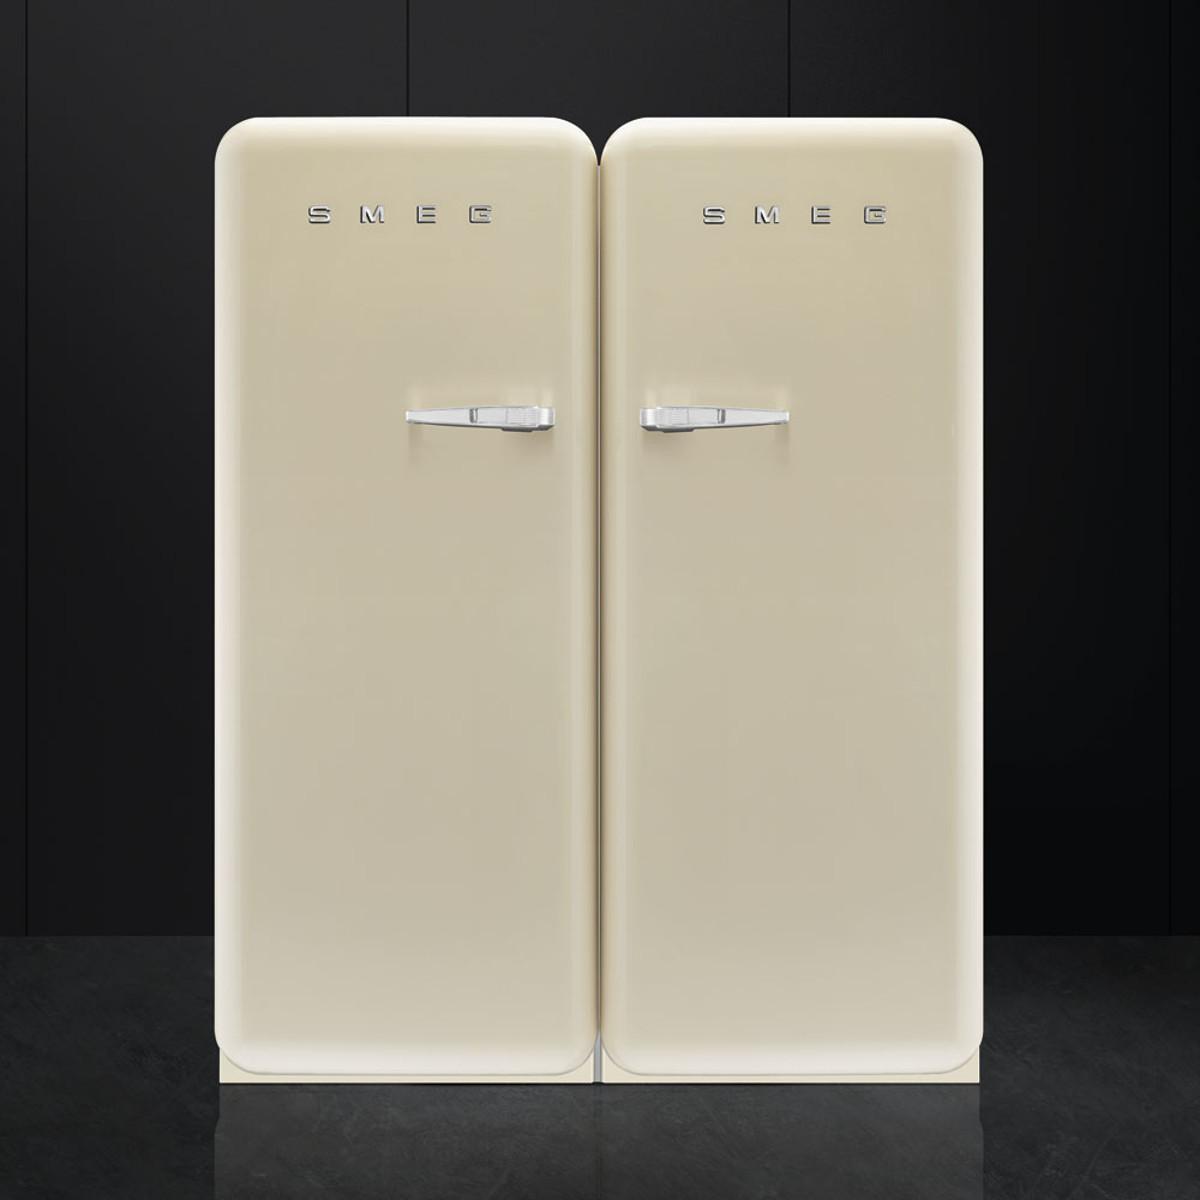 Smeg Cvb20rp1 50s Retro Style Aesthetic Freezer In Cream